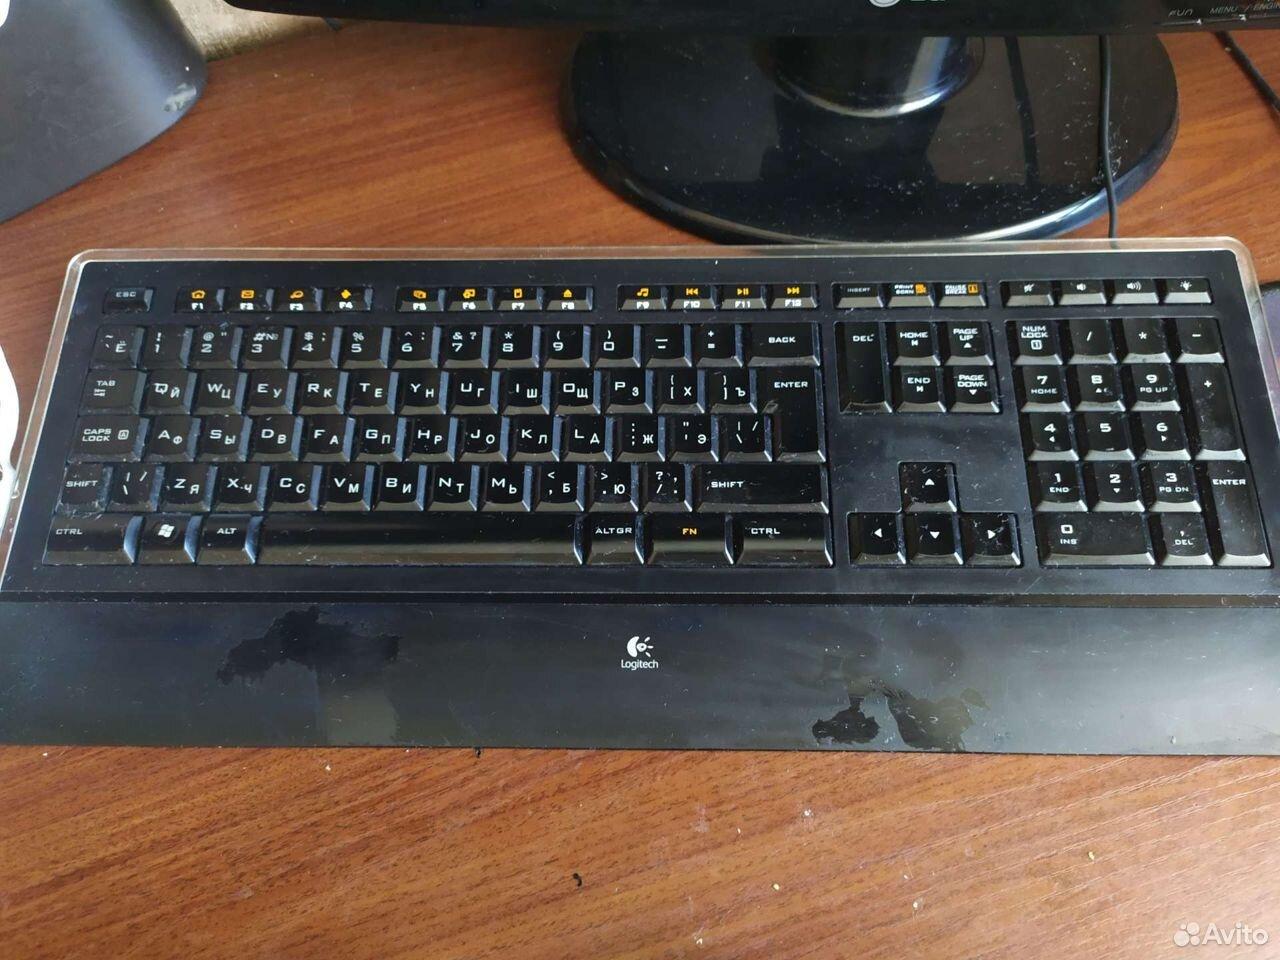 Клавиатура Logitech k740 illuminated keyboard  89508023755 купить 1